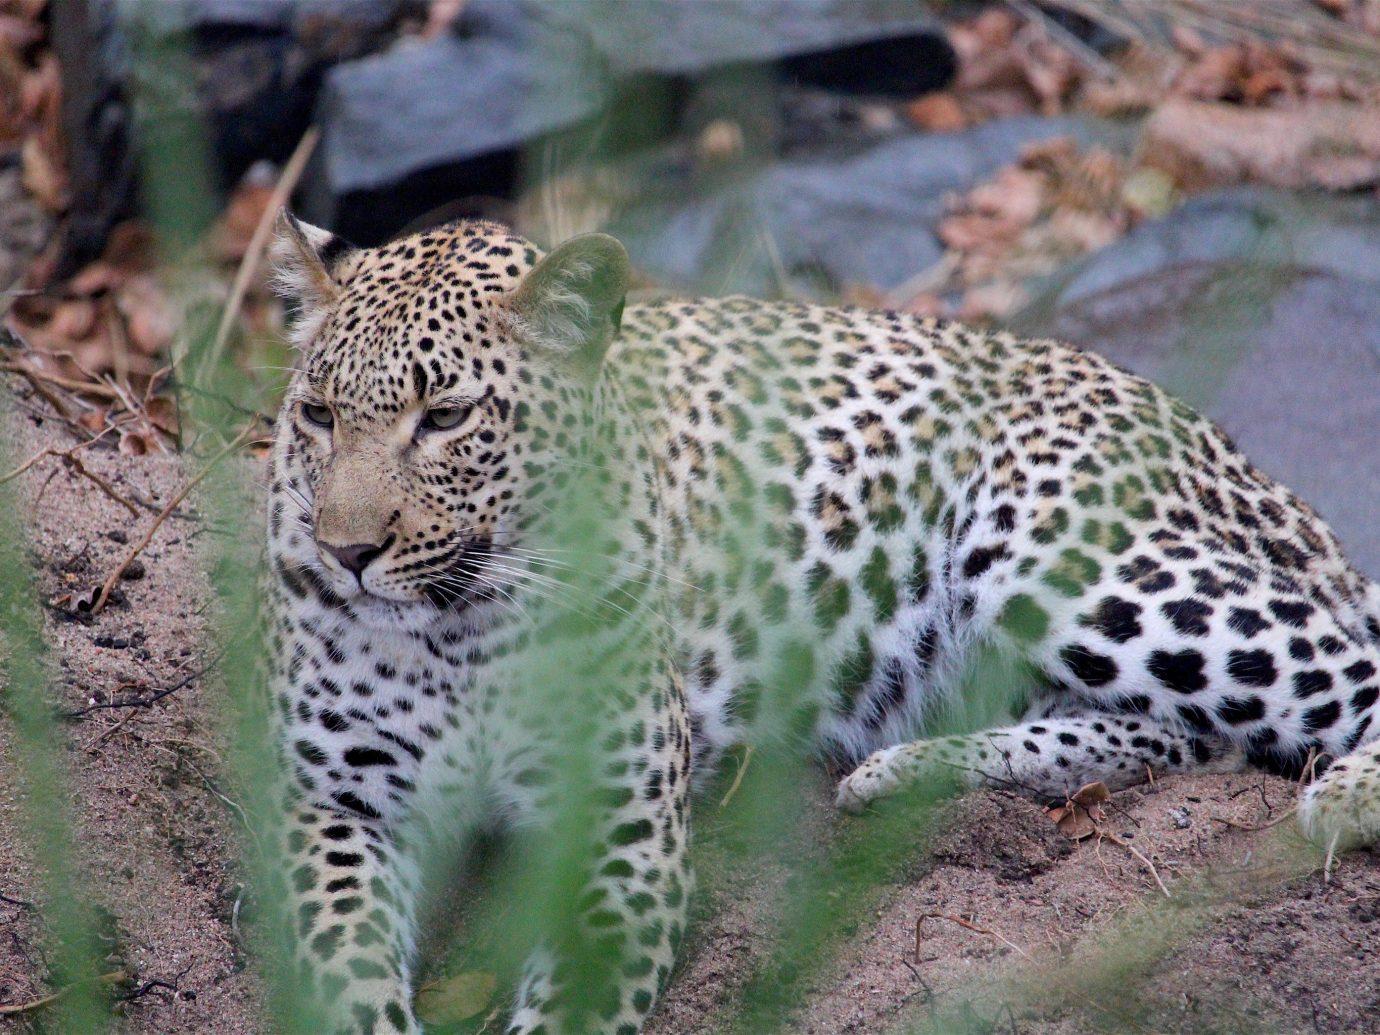 Outdoors + Adventure Safaris Trip Ideas ground big cat outdoor animal mammal leopard vertebrate Wildlife fauna jaguar cat like mammal cheetah big cats dirt zoo